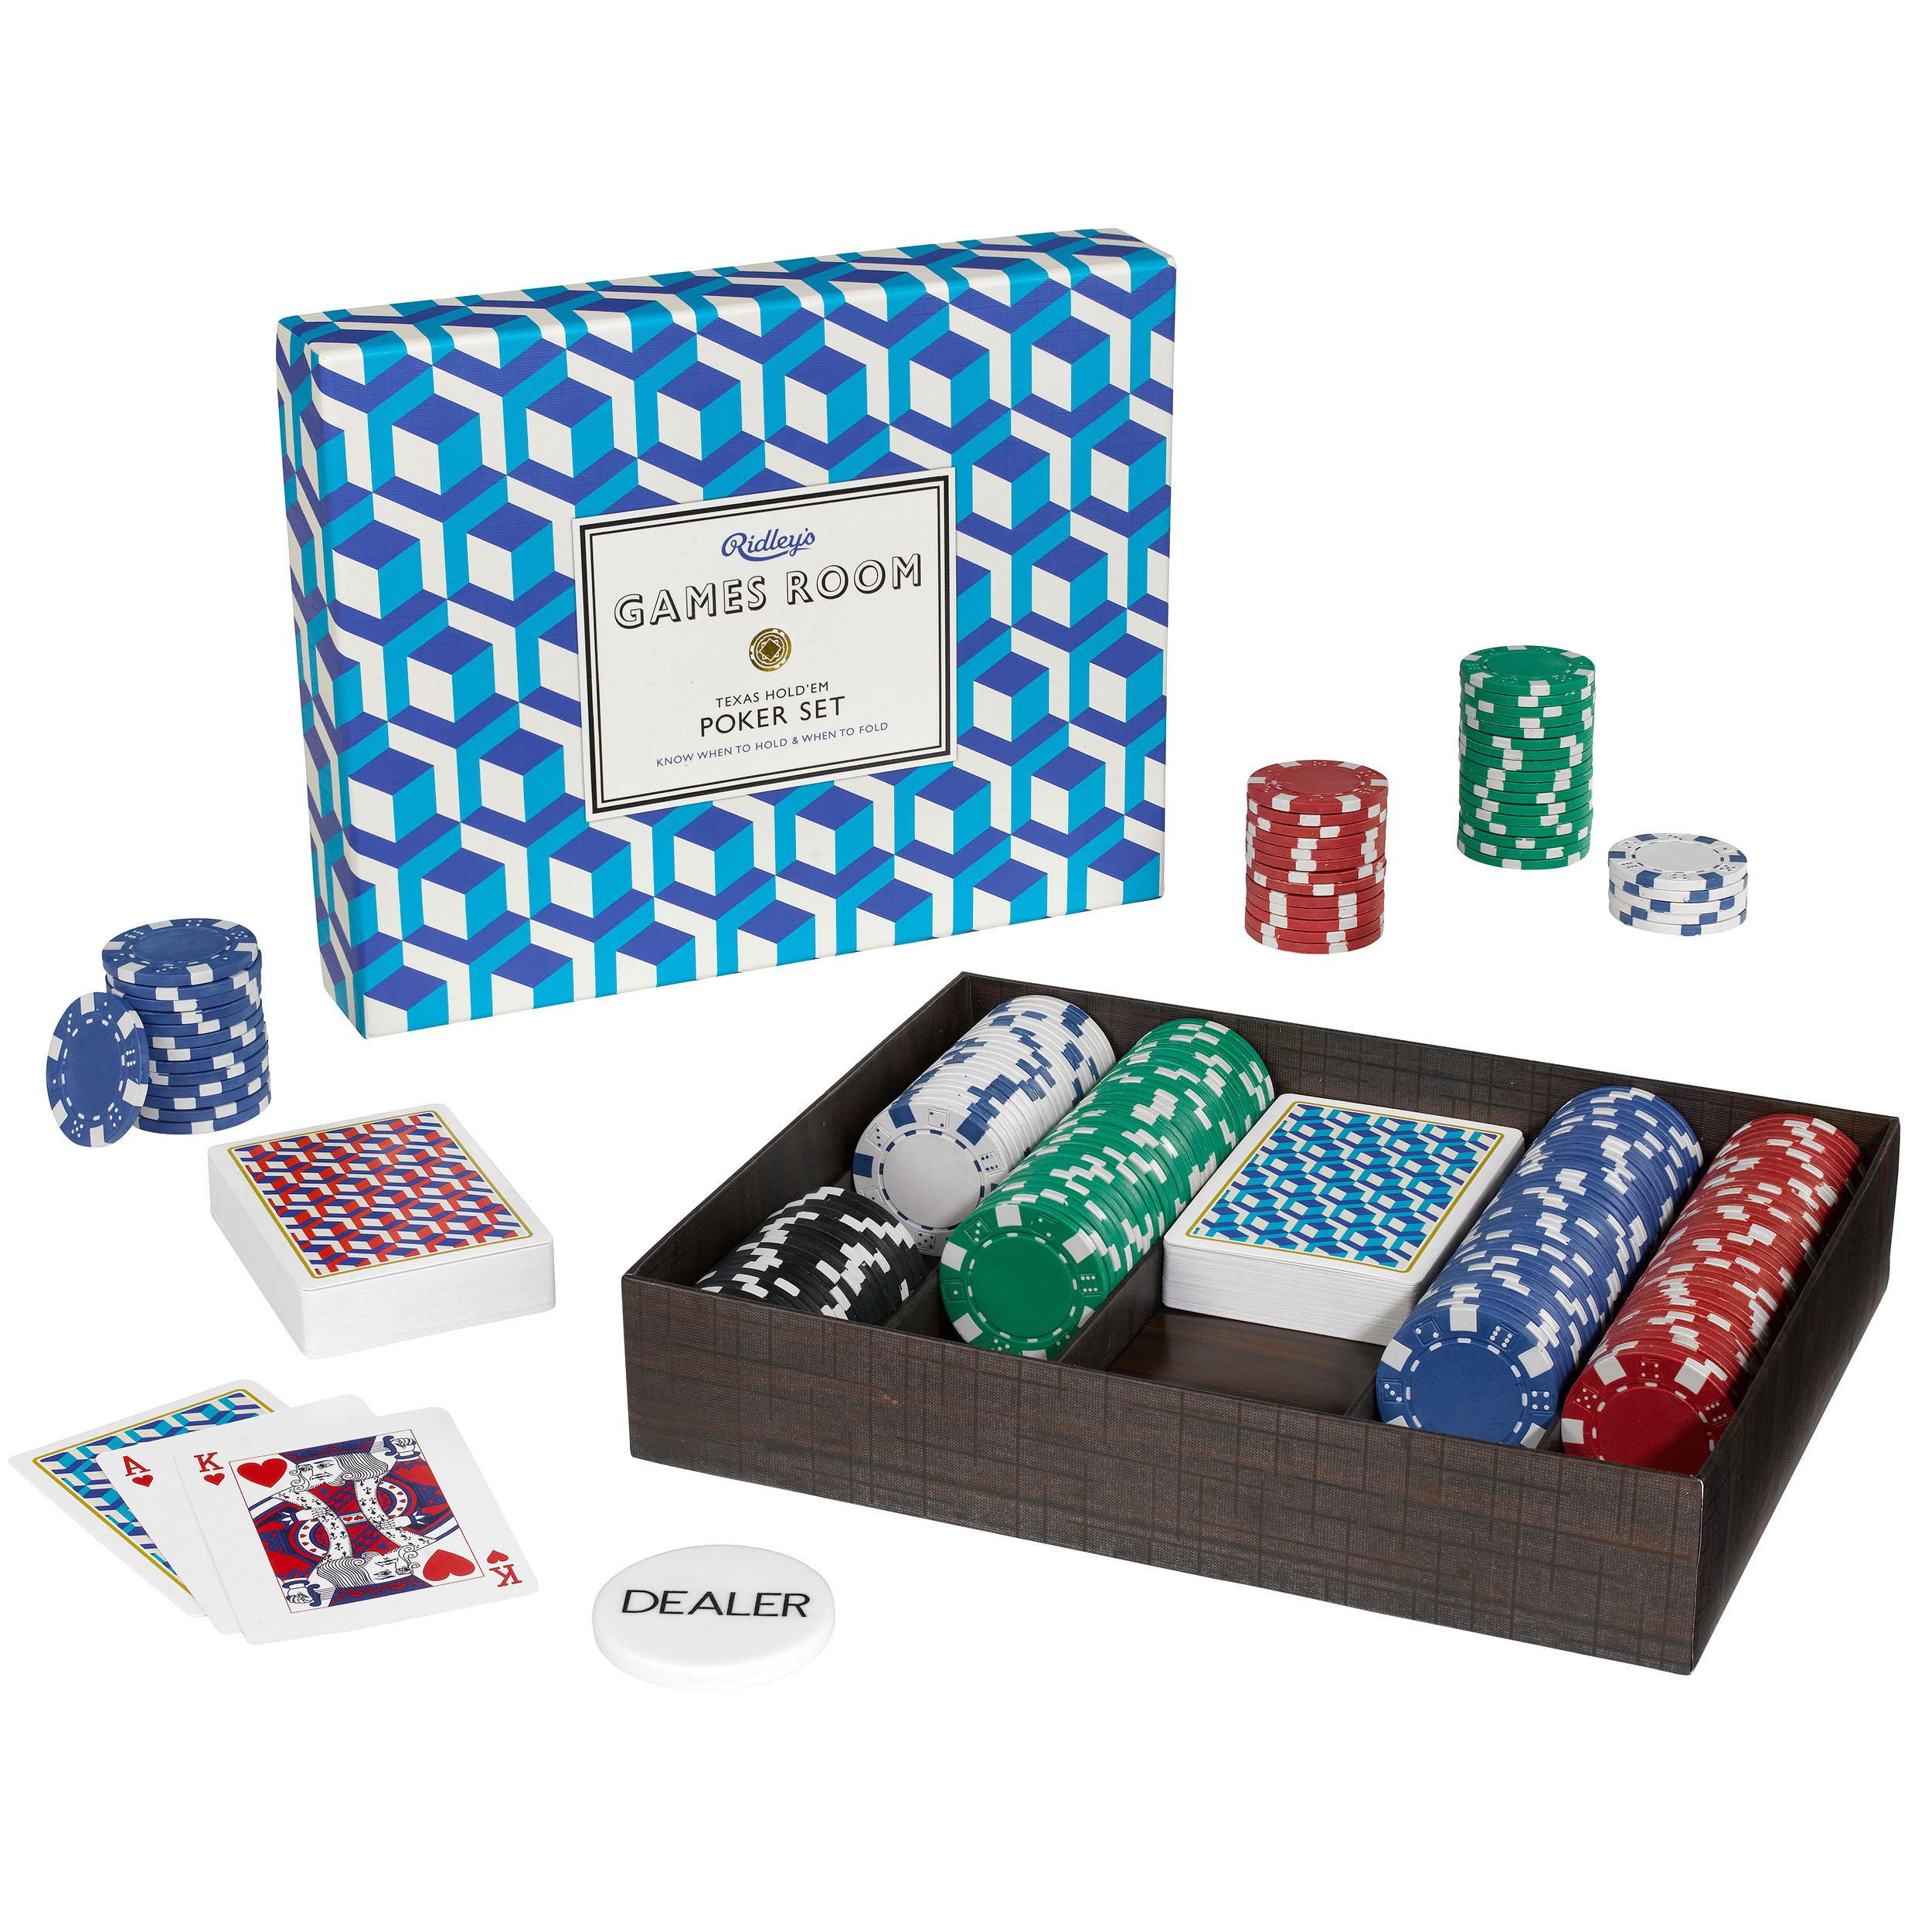 Ridley's Utopia Games Room Poker Set